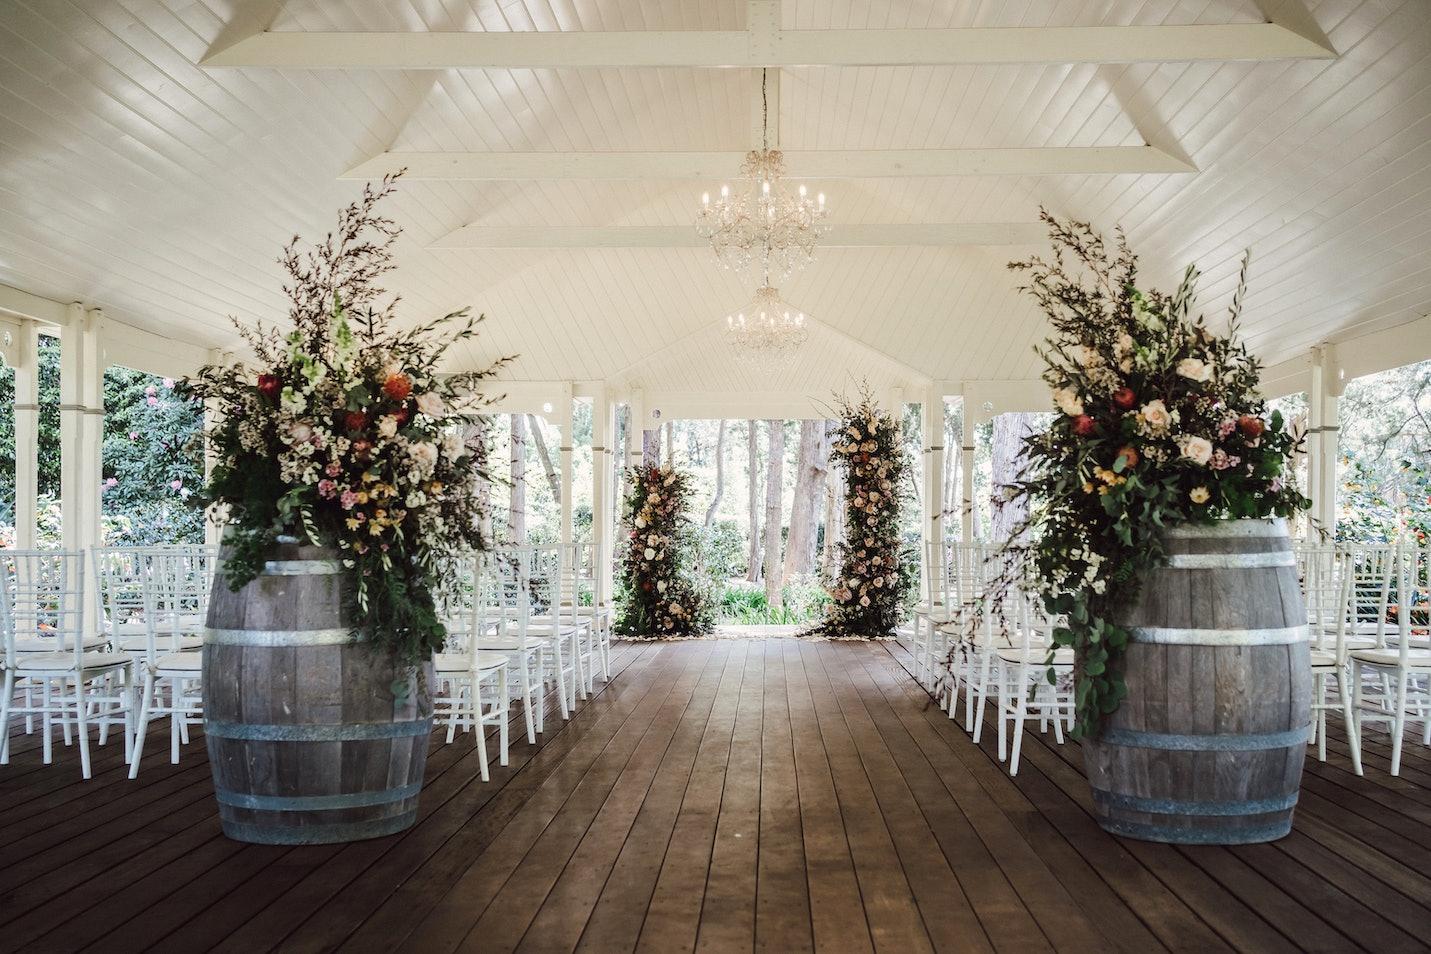 Flower arrangements on wine barrels in the pavilion